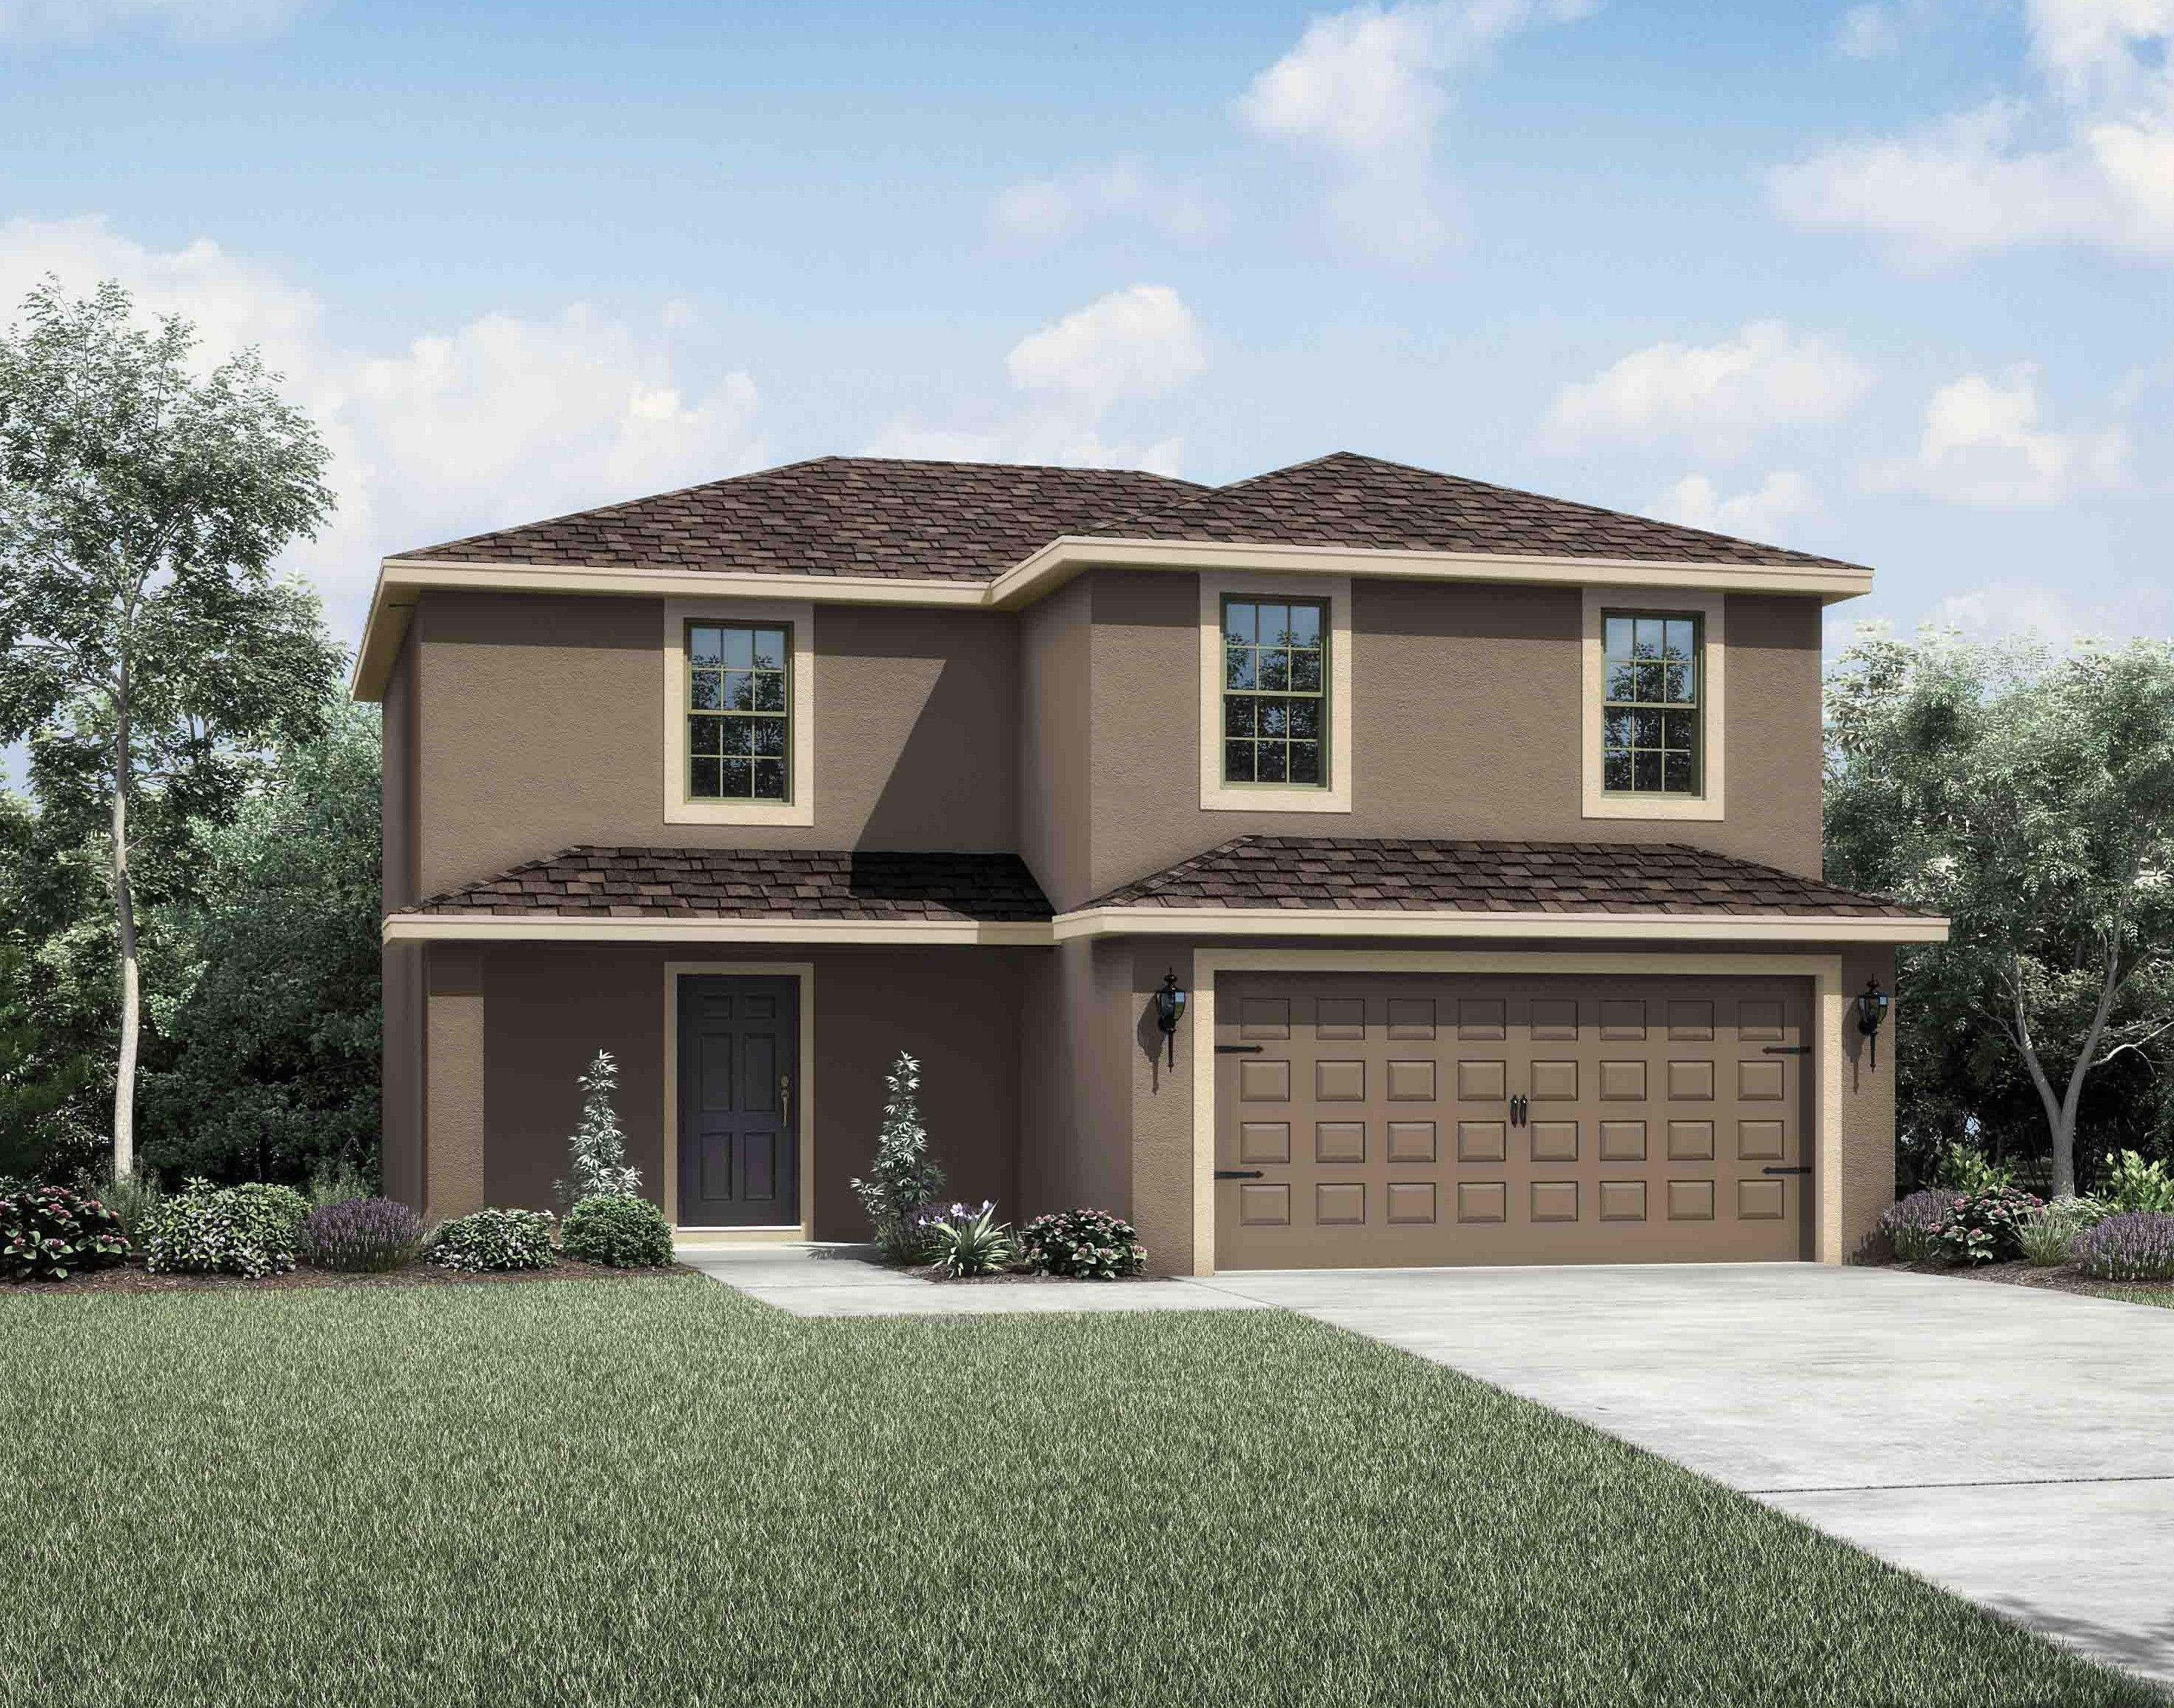 Highlands in Deland FL New Homes Floor Plans by LGI Homes